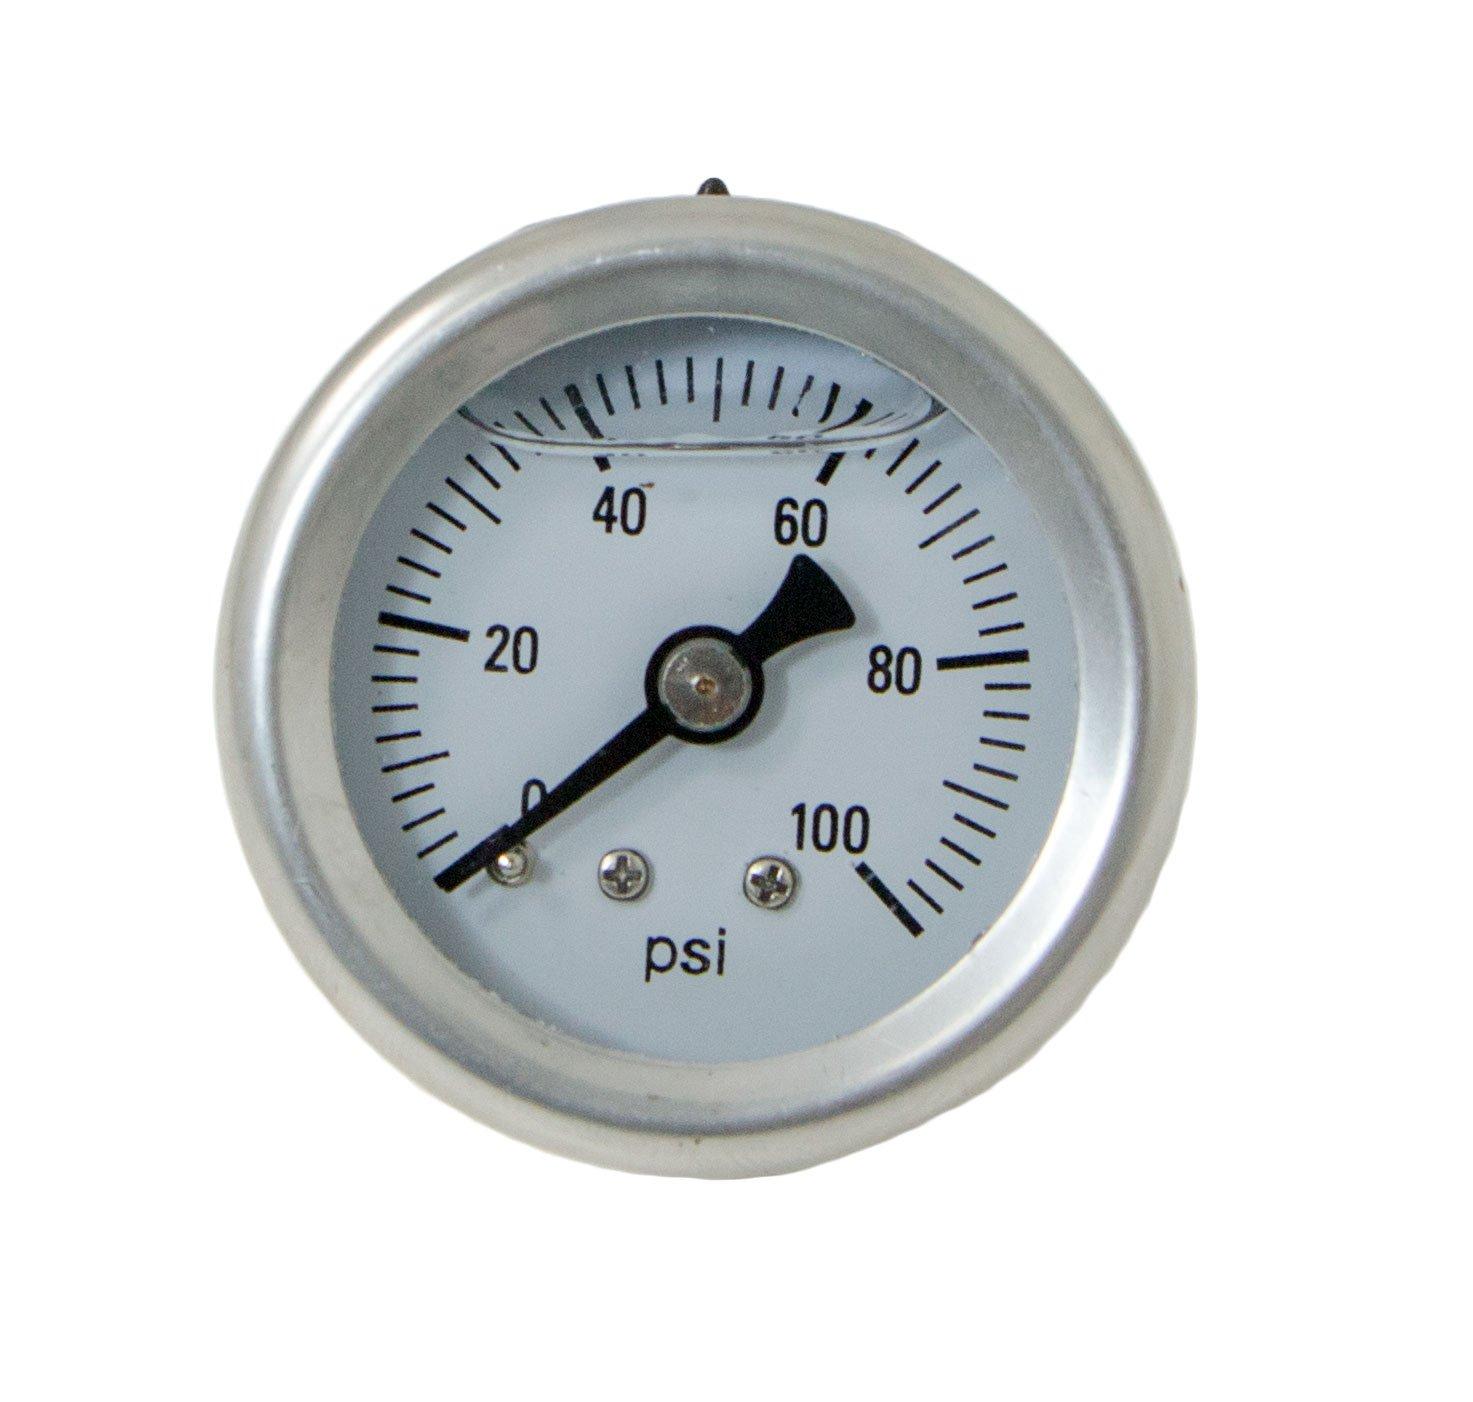 Top Street Performance JM1018 1/8' NPT Liquid Filled Fuel Pressure Gauge (0-100 psi)